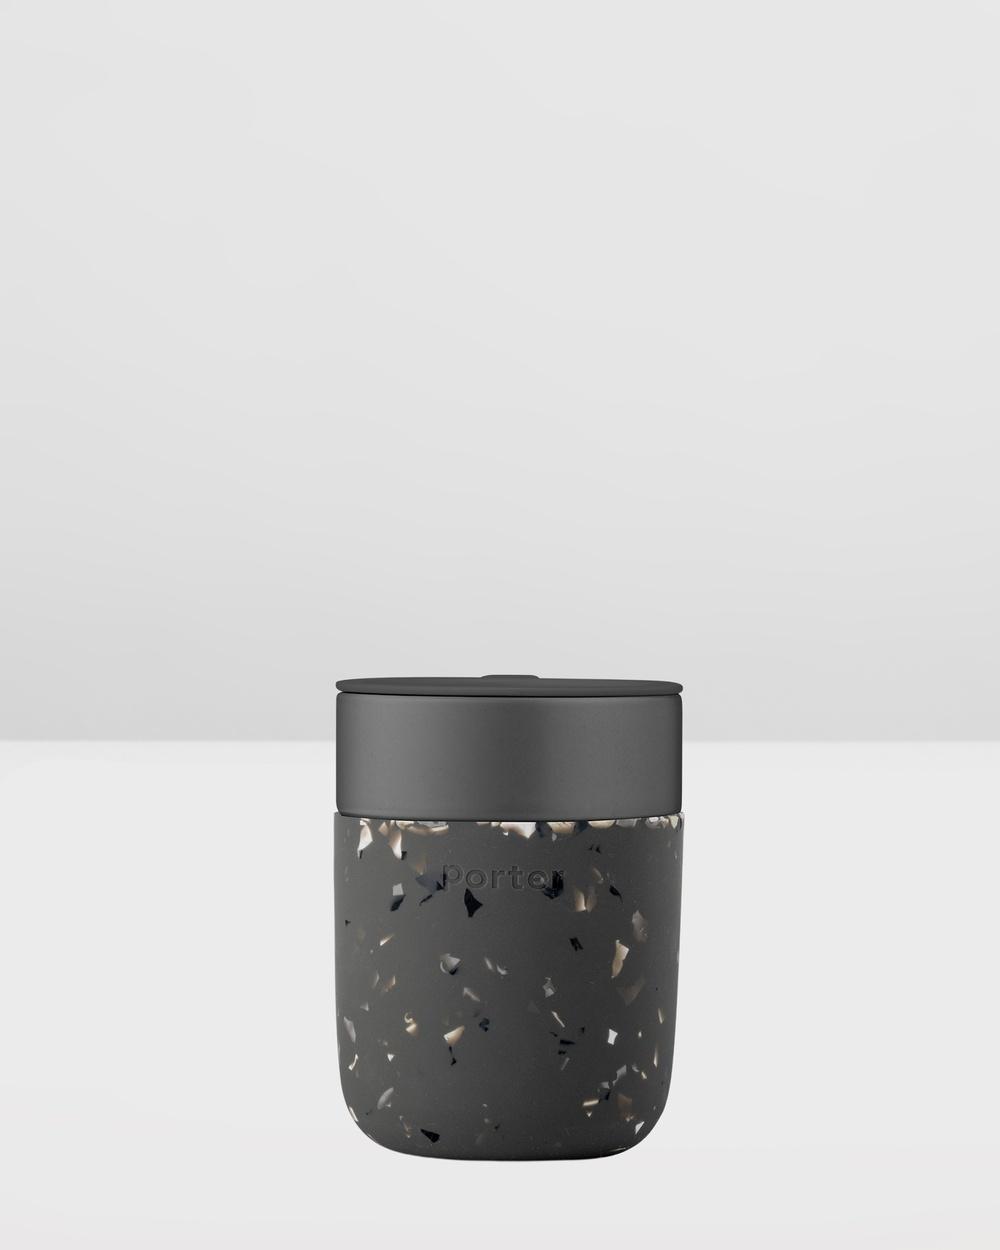 Porter Ceramic Mug Terrazzo 355ml Home Black